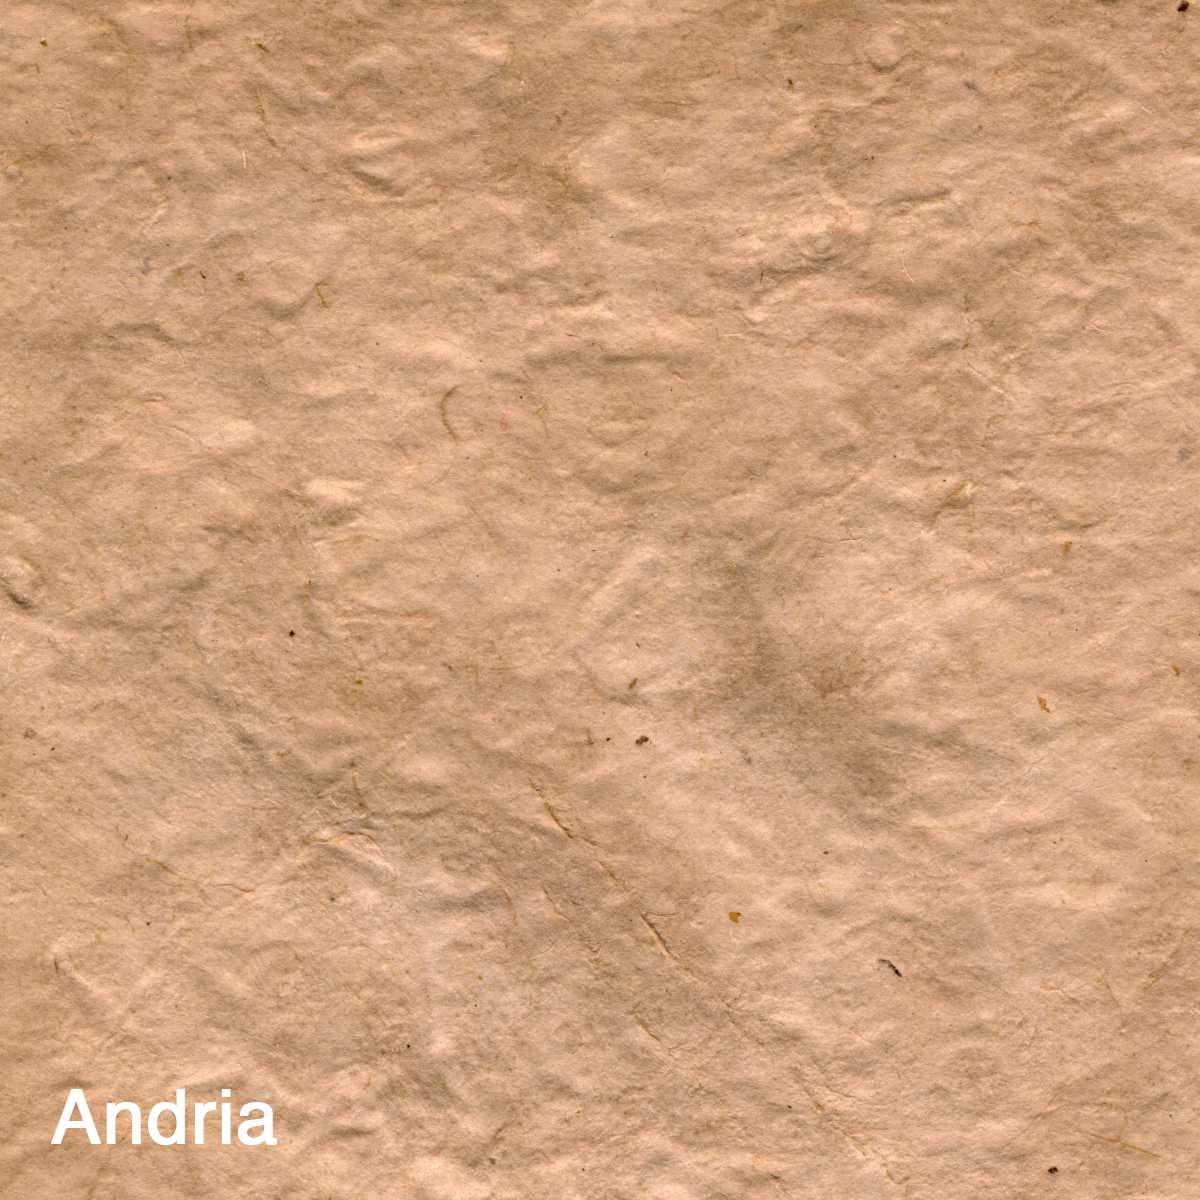 Andria011 copy.jpg